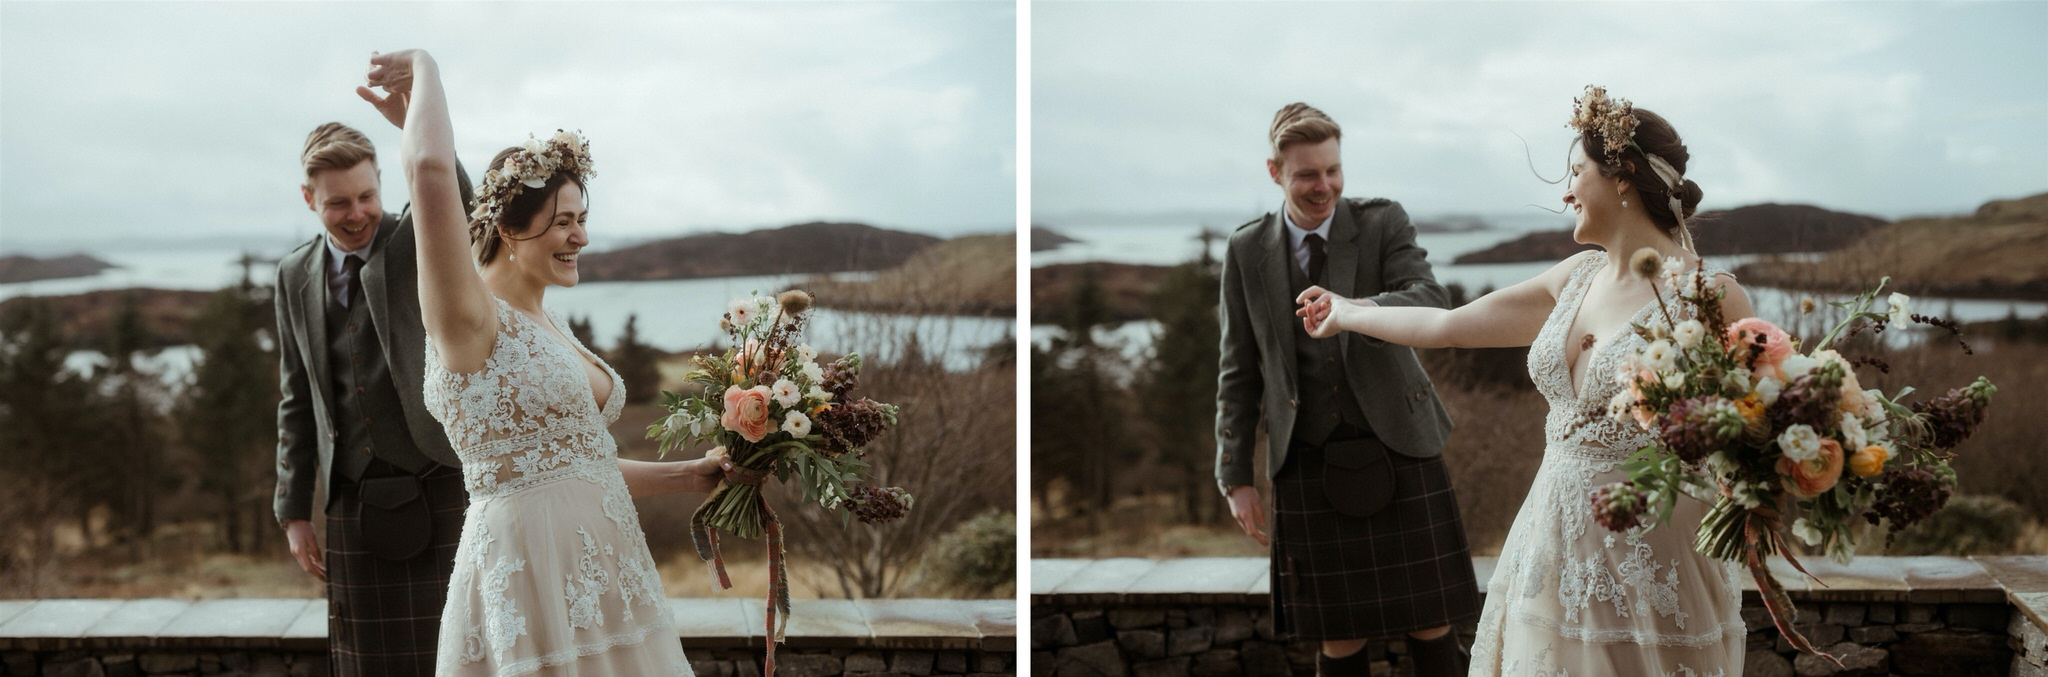 Bride and groom looking joyful during their Scotland elopement wedding in Assynt